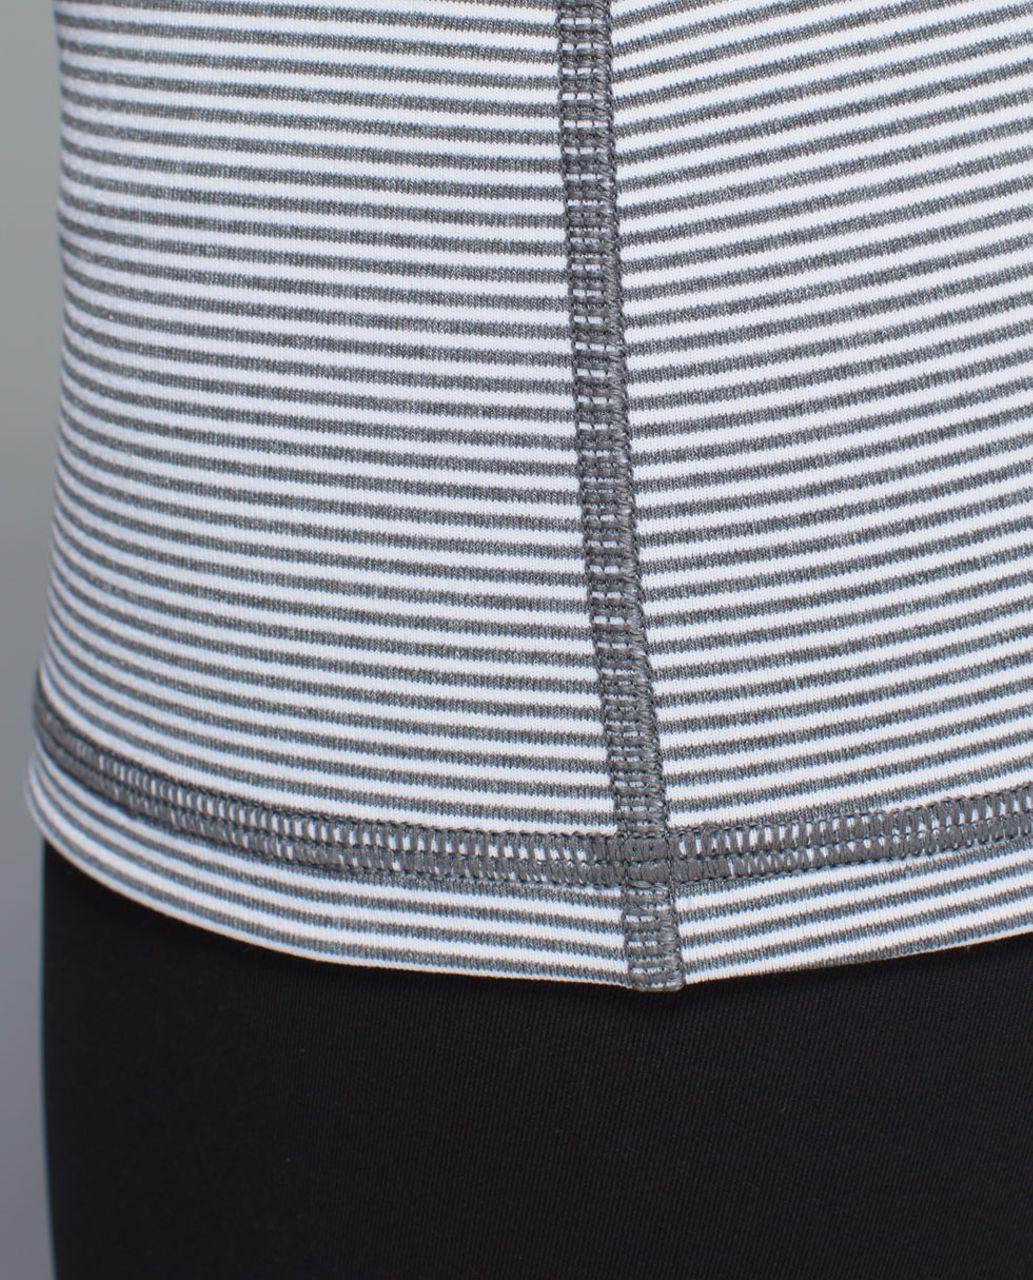 Lululemon Power Y Tank *Luon - Tonka Stripe Heathered Slate White